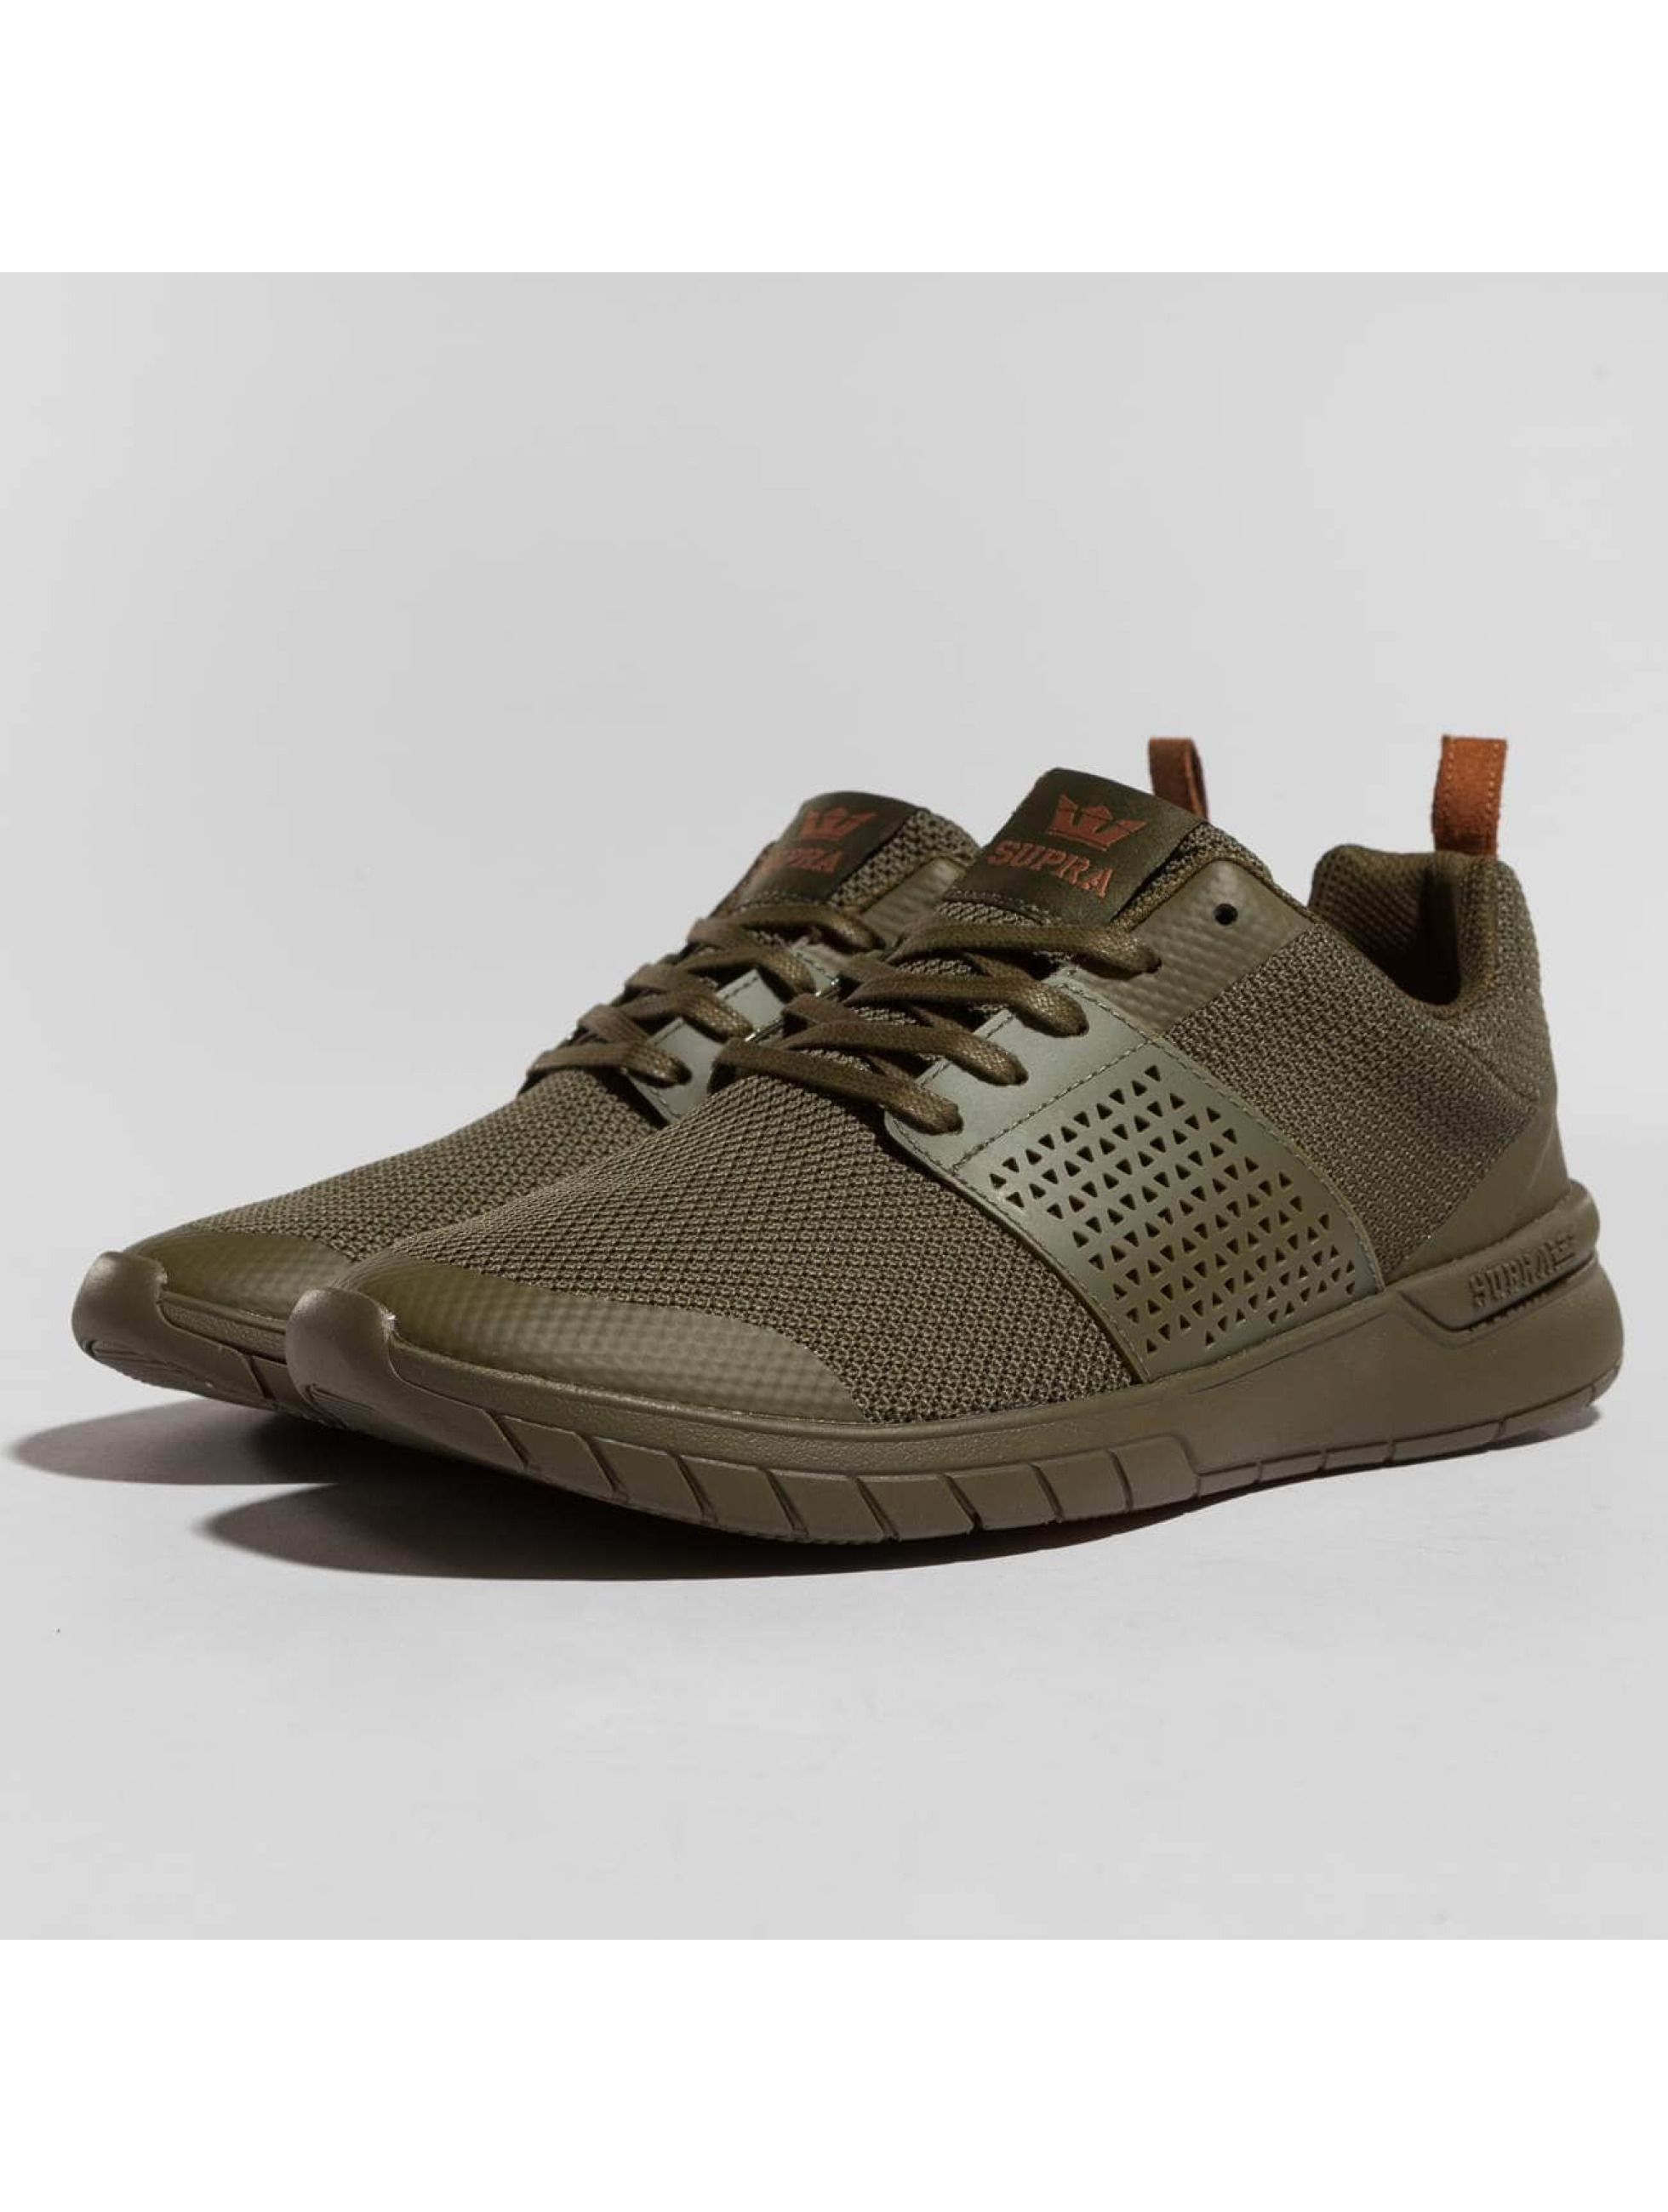 Vert Olive Chaussures Supra En Taille 46 Hommes btluFU